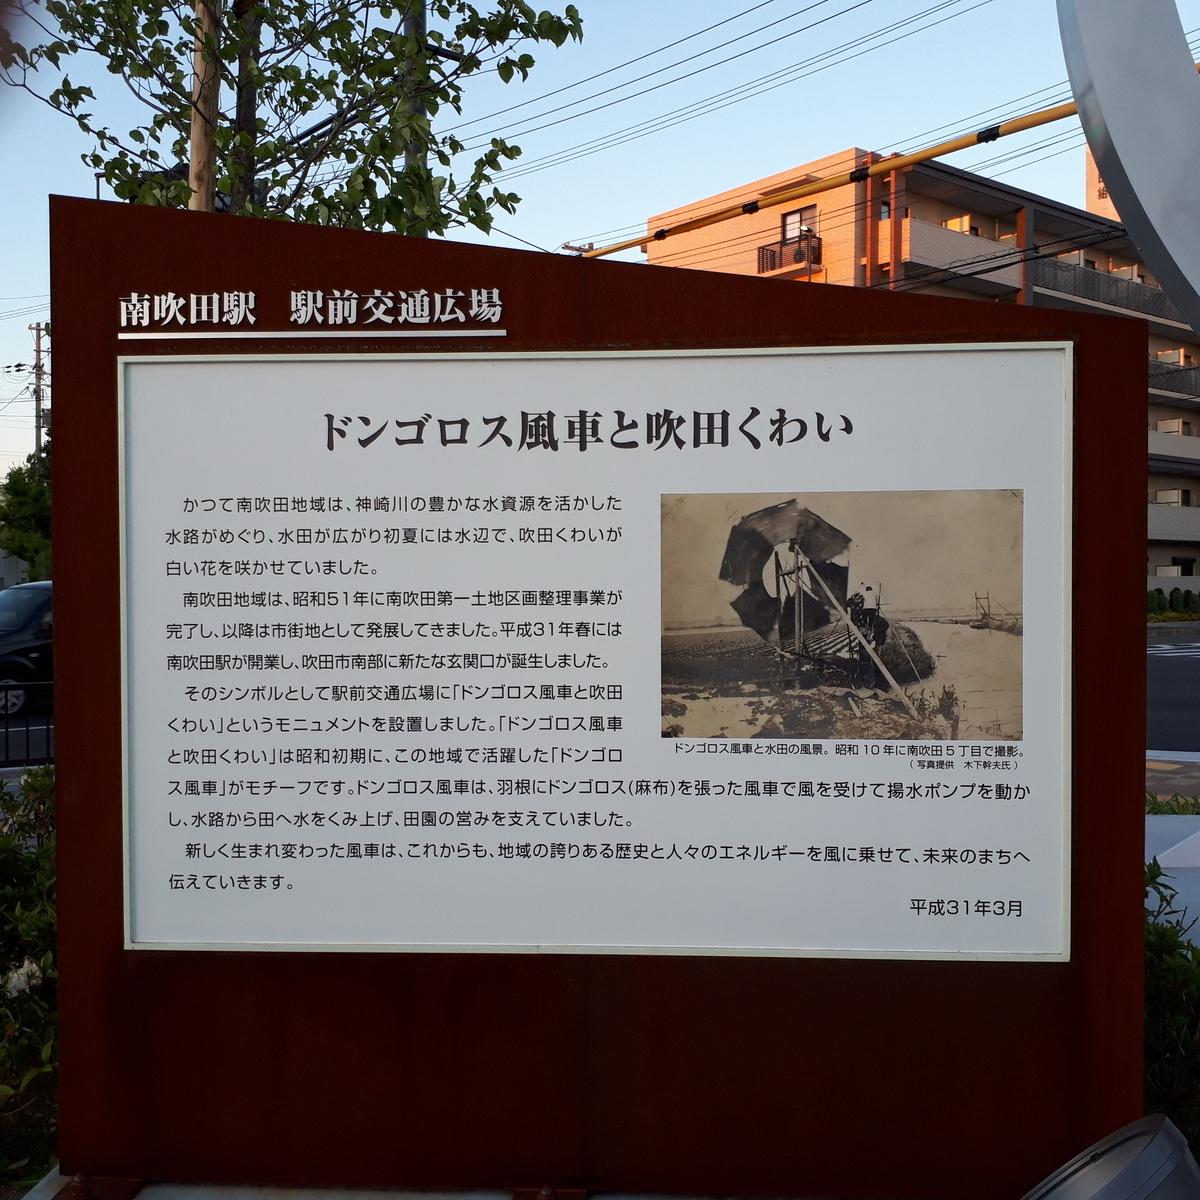 JR南吹田駅 モニュメント ドンゴロス風車と吹田くわい